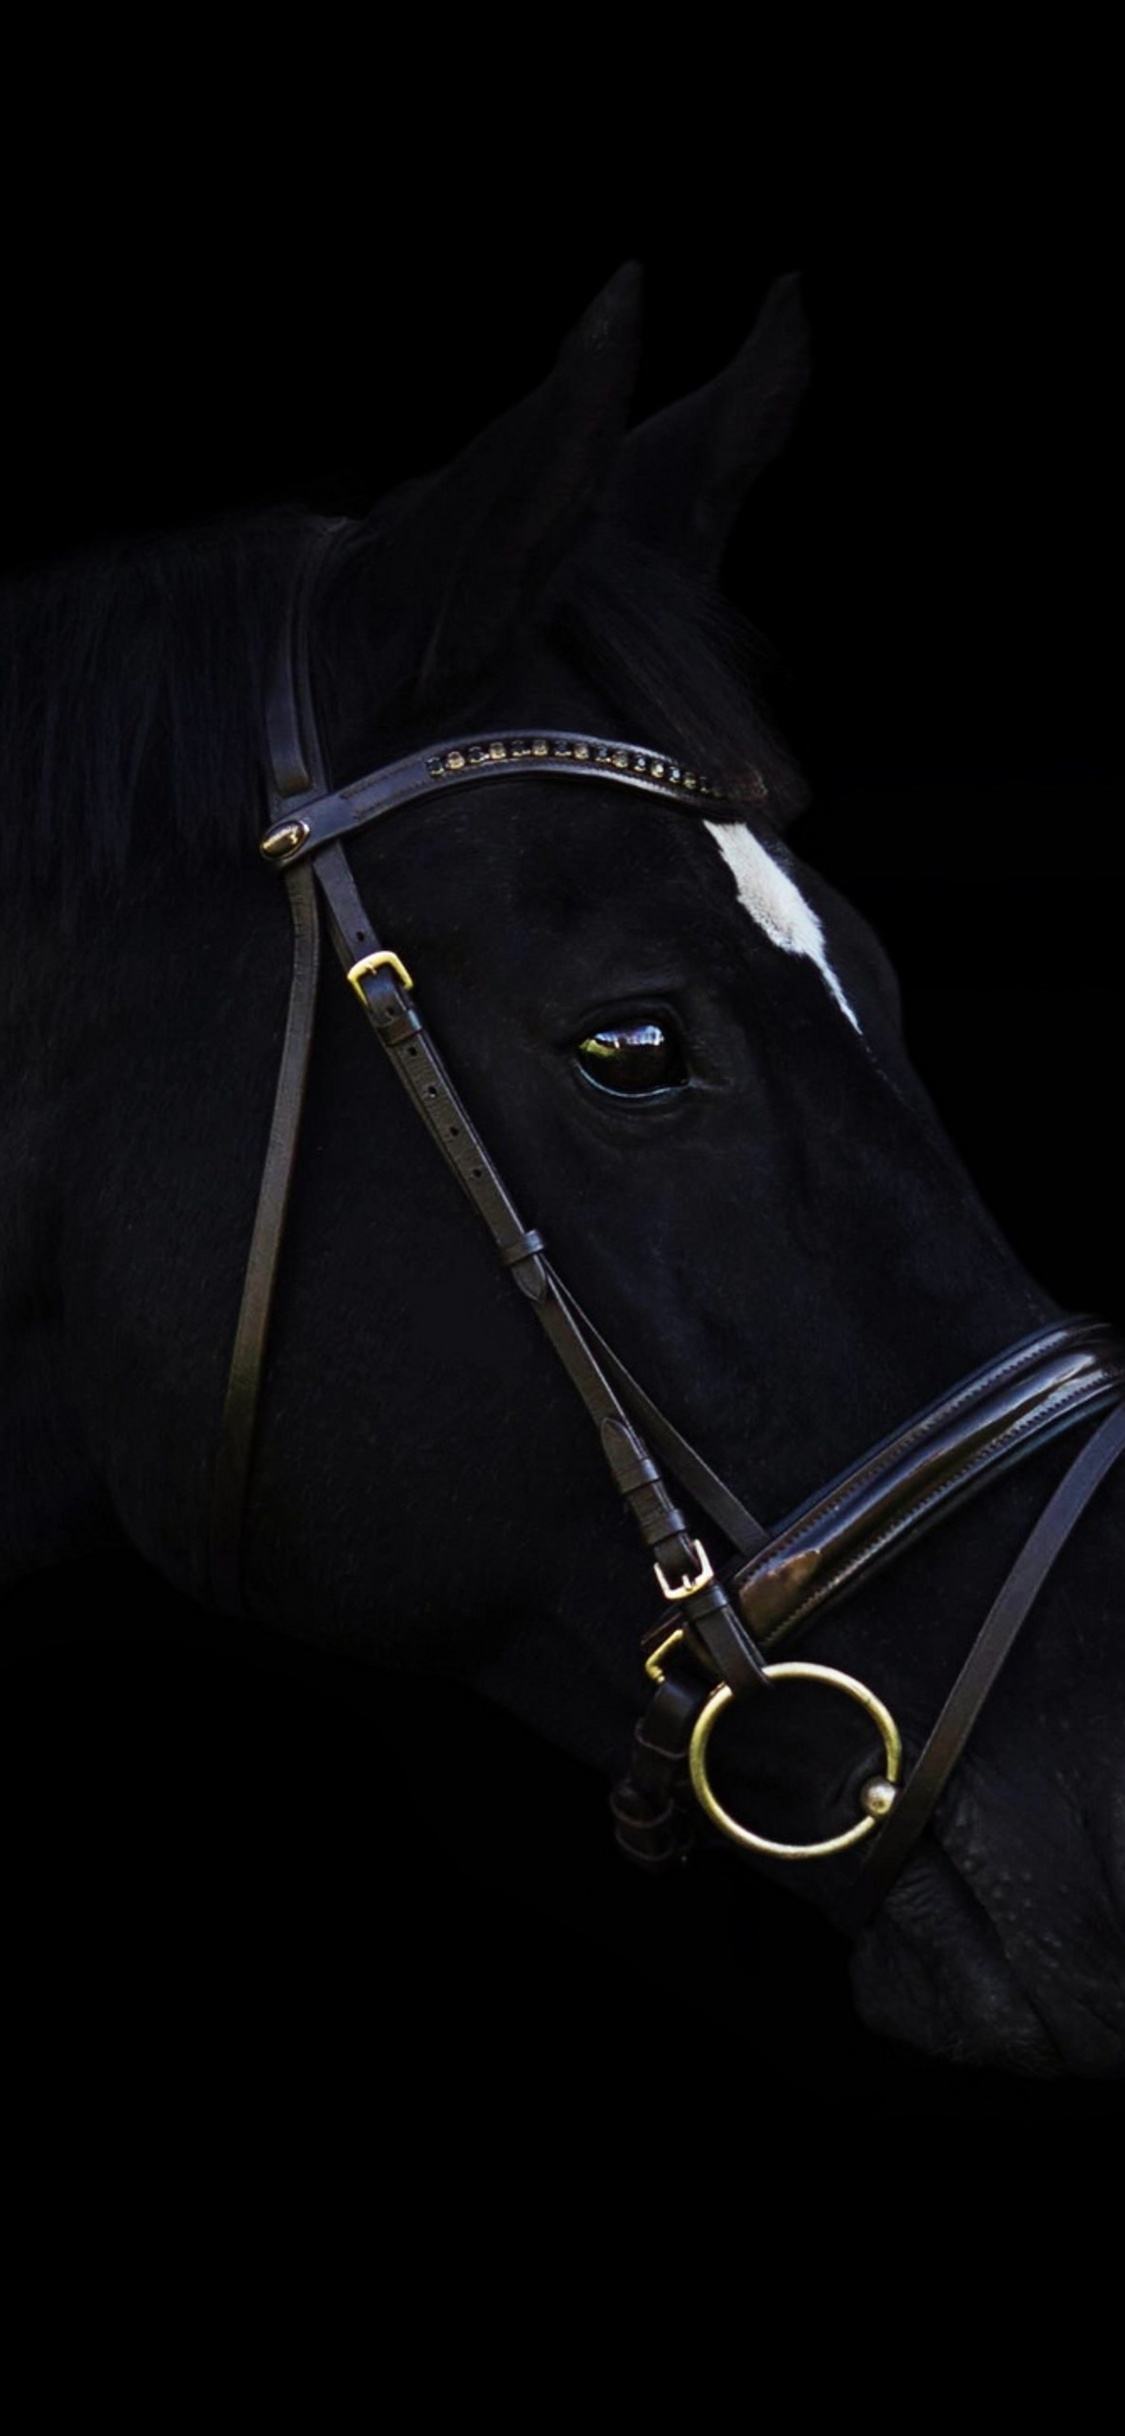 1125x2436 Dark Horse Iphone XIphone 10 HD 4k Wallpapers Images